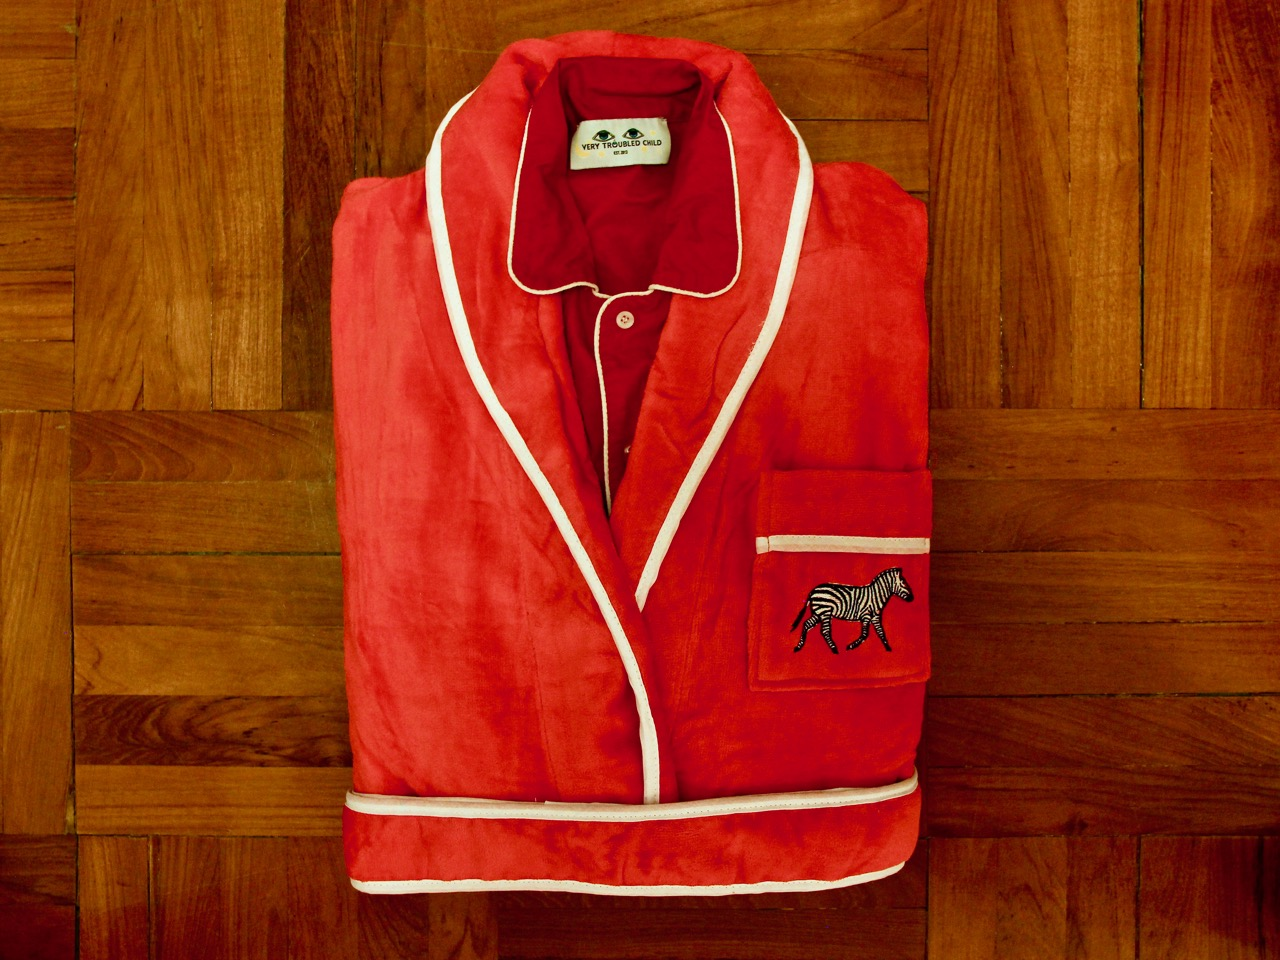 Masai Travel Robe